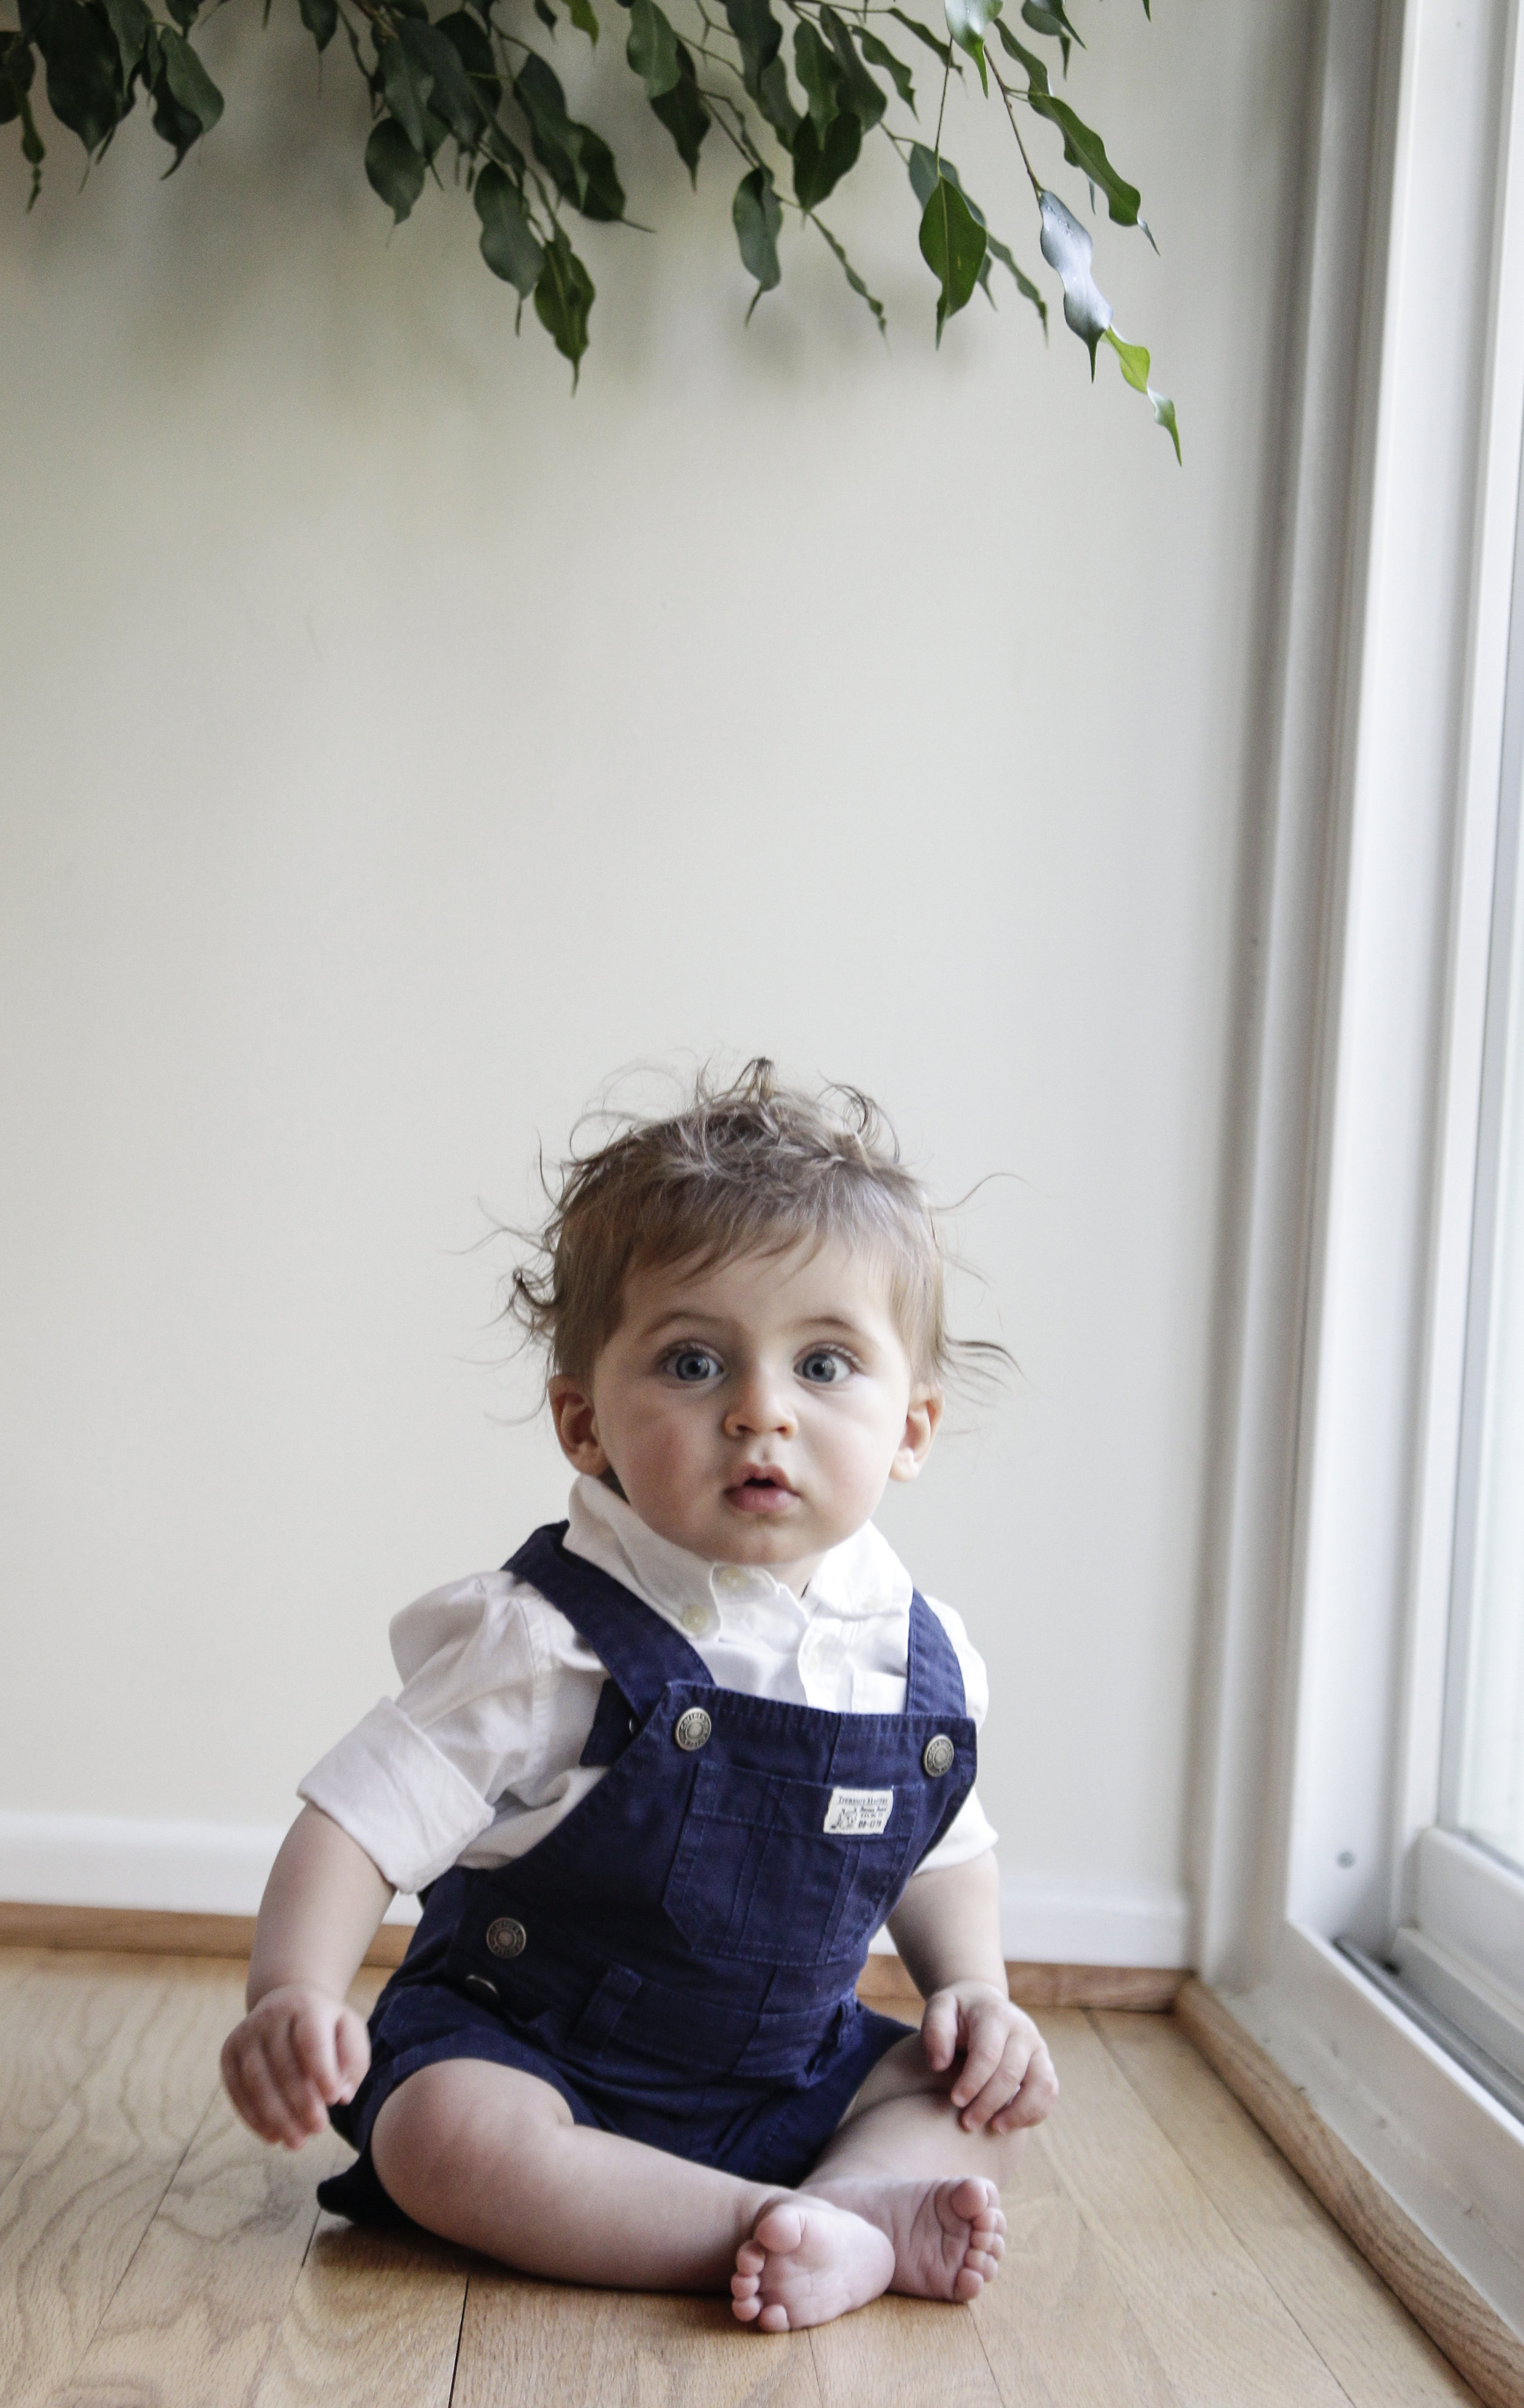 Baby Alex on Floor.jpg